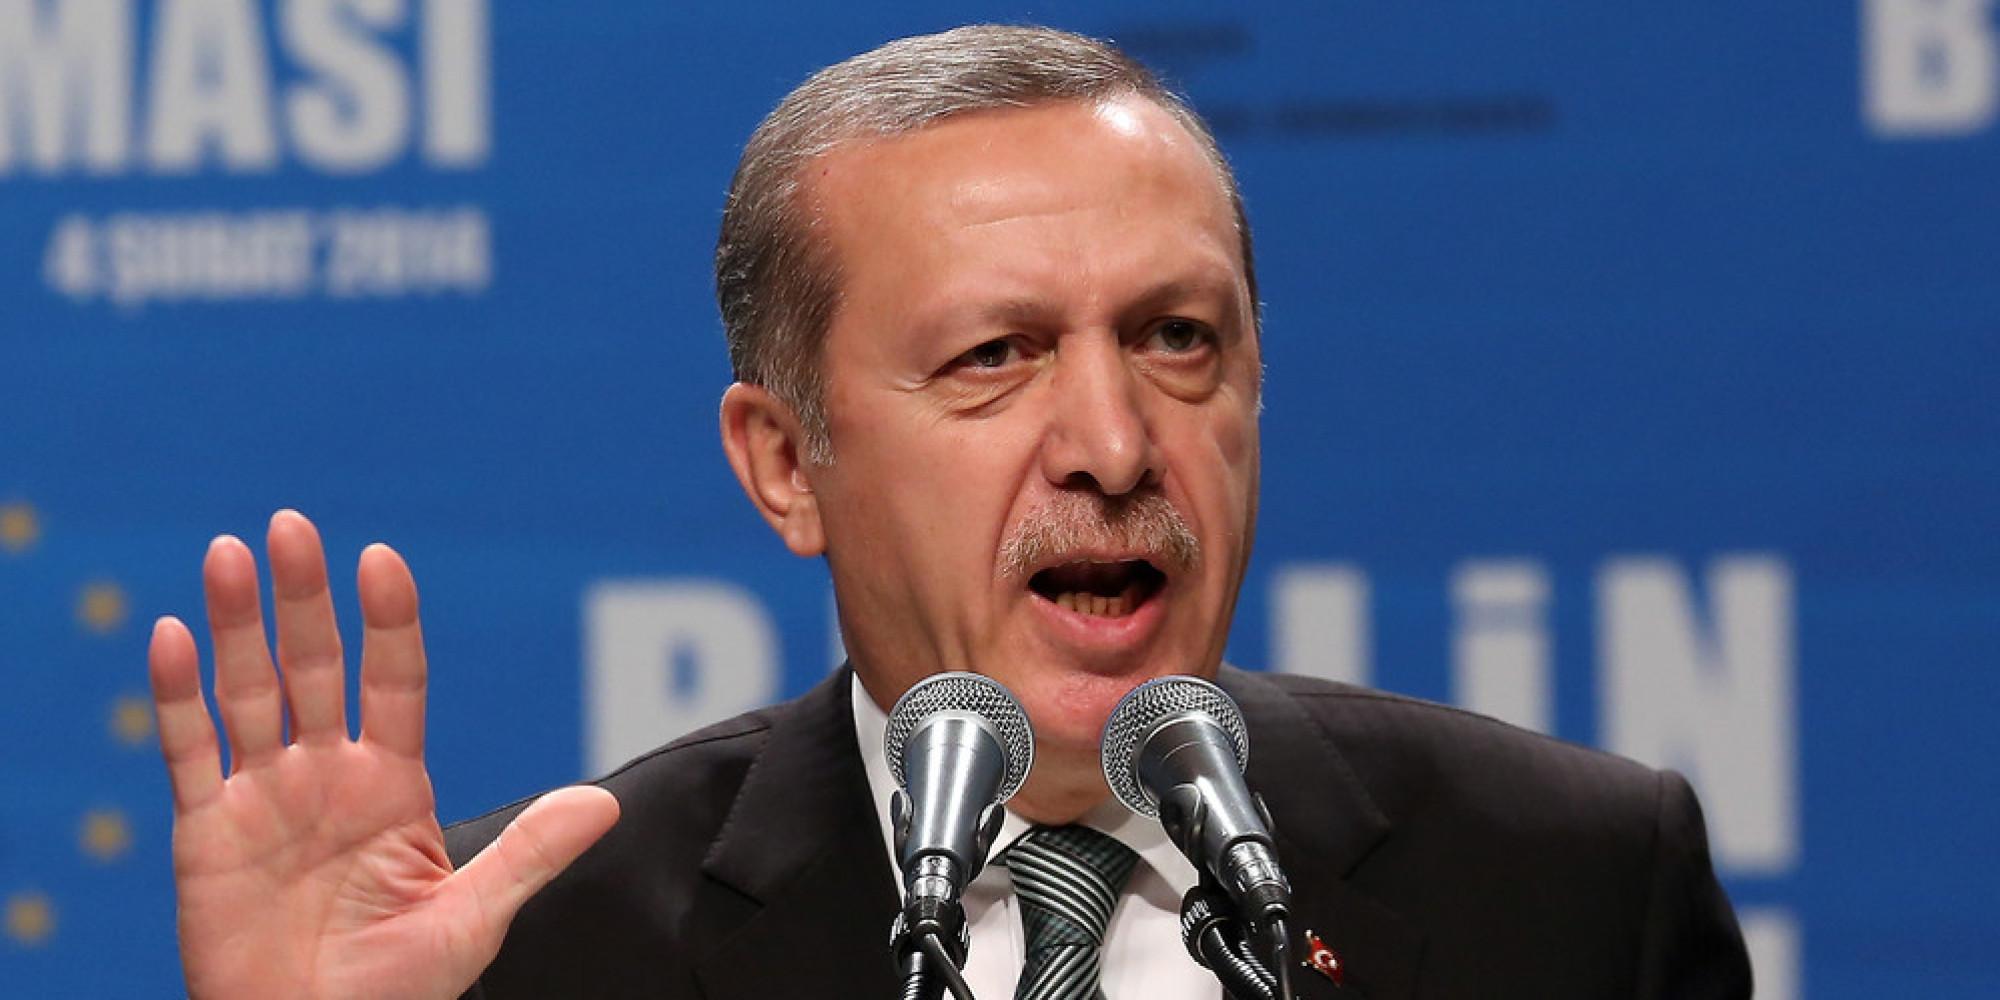 Erdogan Facebook